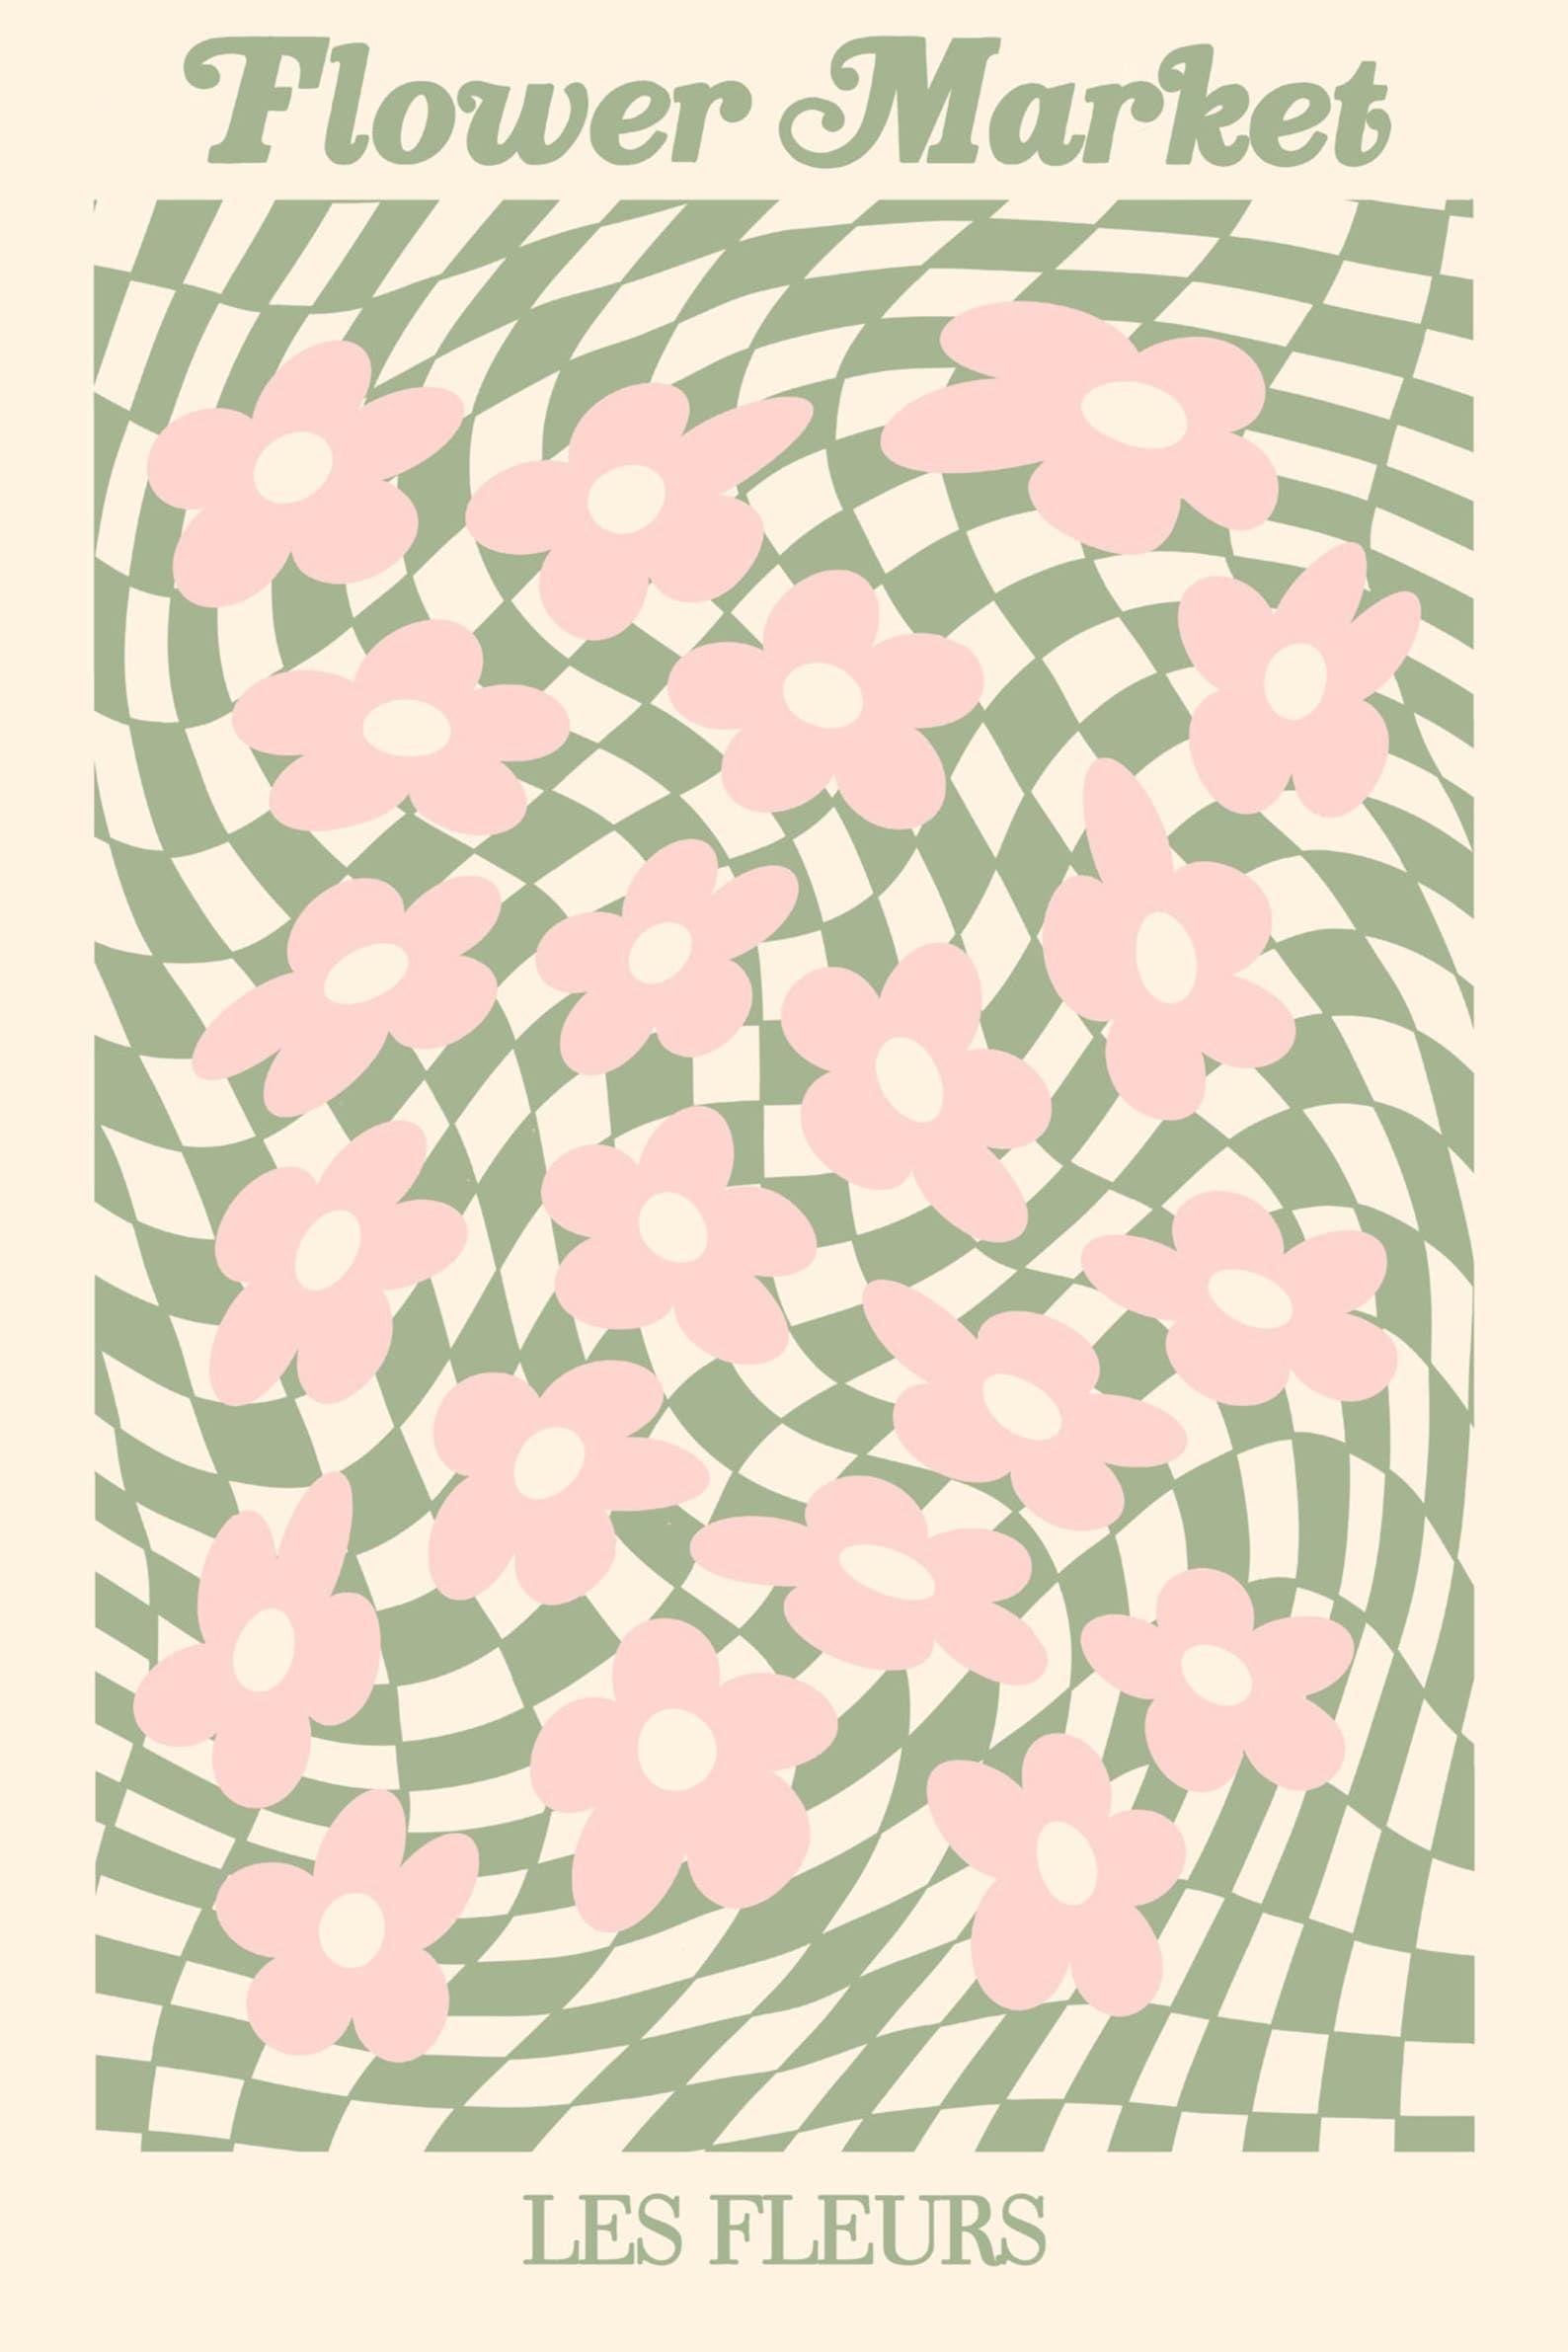 118 Danish Pastel Aesthetic Wall Collage Kit, Danish Pastel Room Decor, Pinterest Prints, Aesthetic Collage Kit, Danish Pastel Poster Set